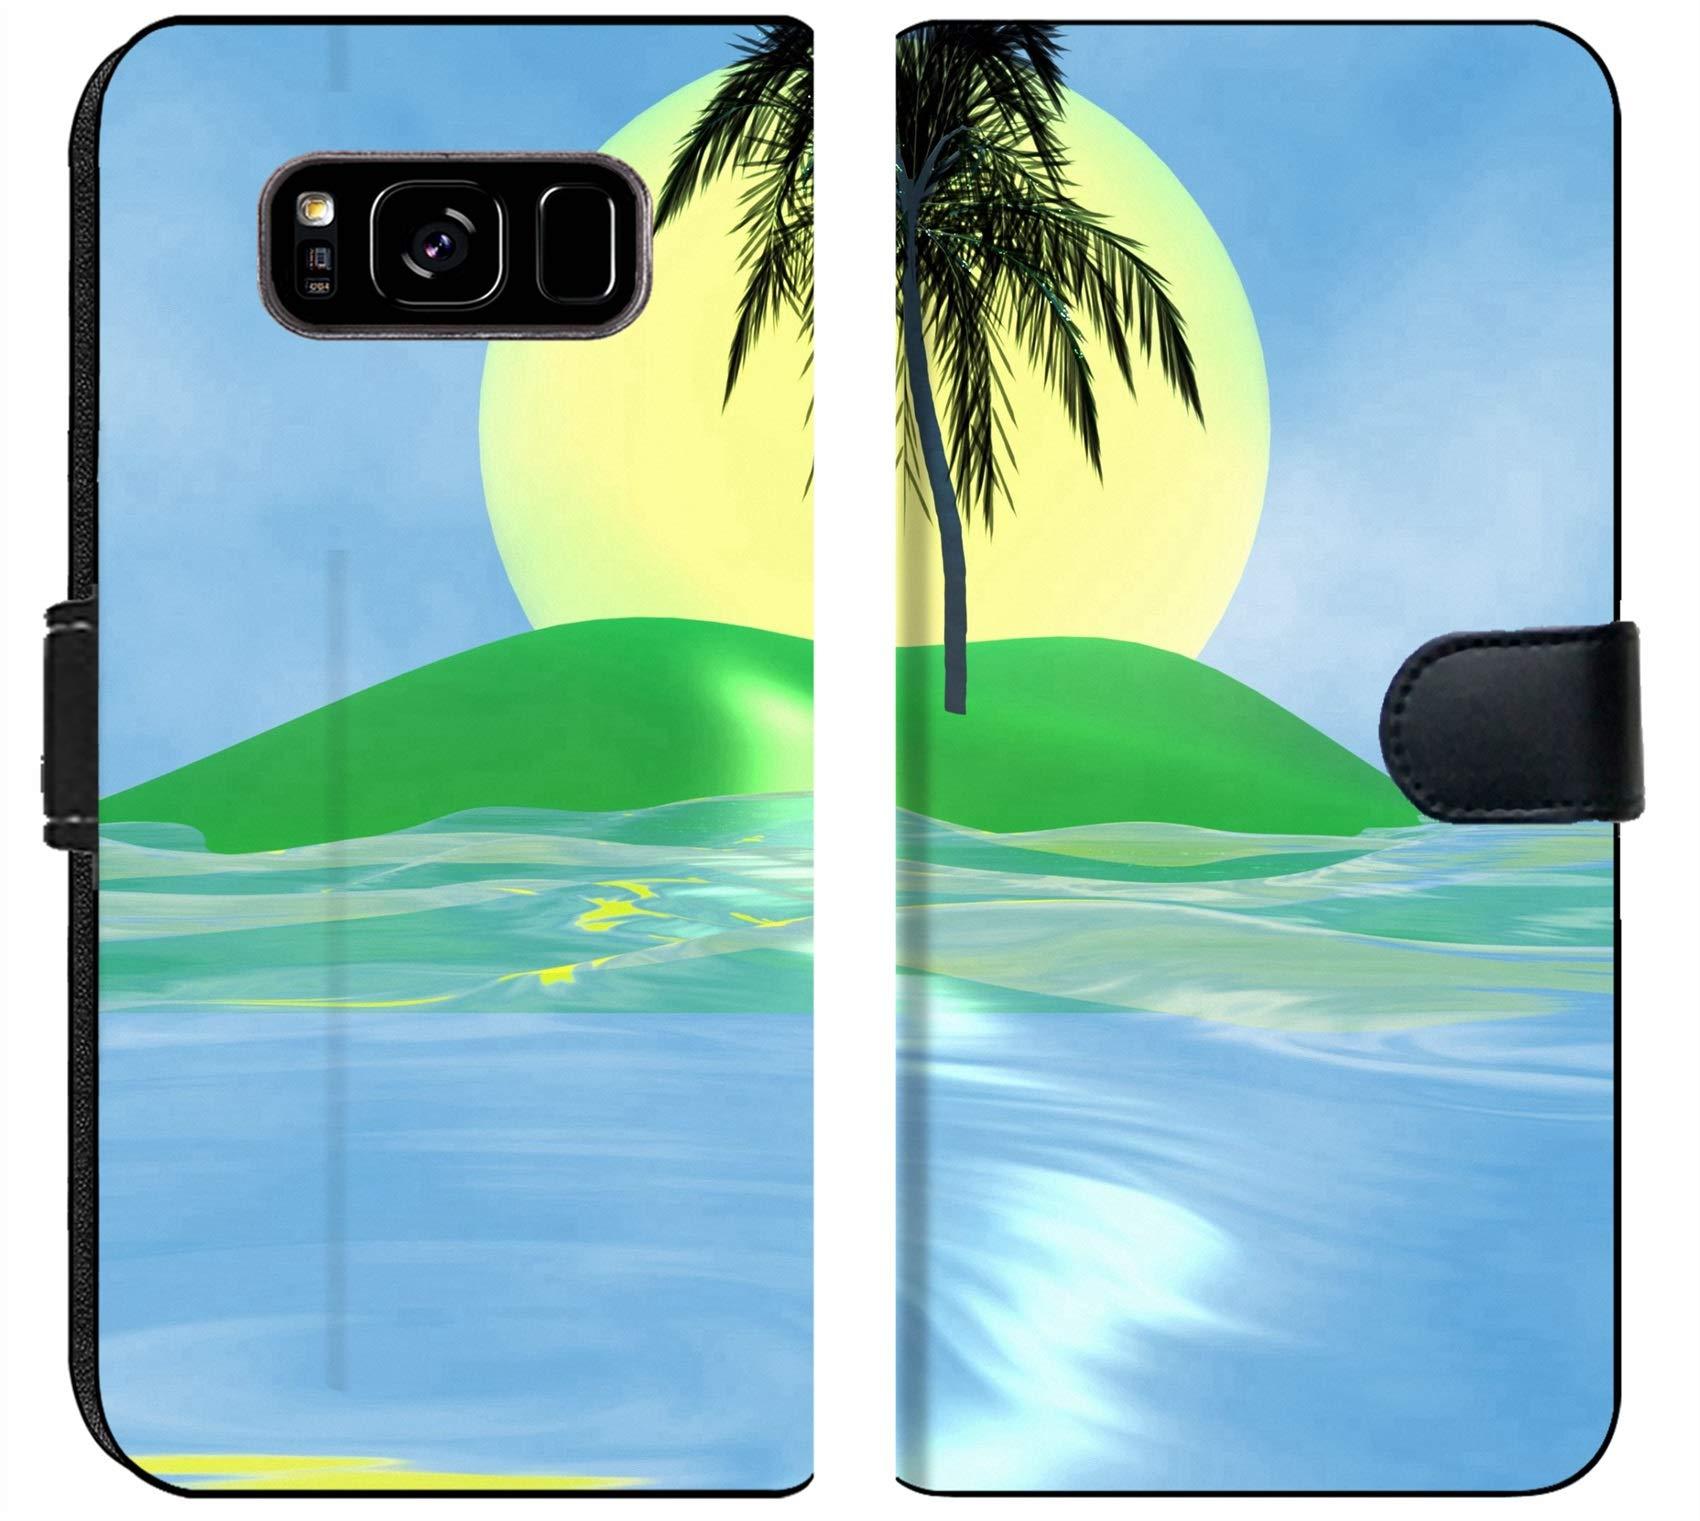 Luxlady Samsung Galaxy S8 Plus Flip Fabric Wallet Case Solar island with a palm tree in the huge dark blue sea IMAGE ID 2842537